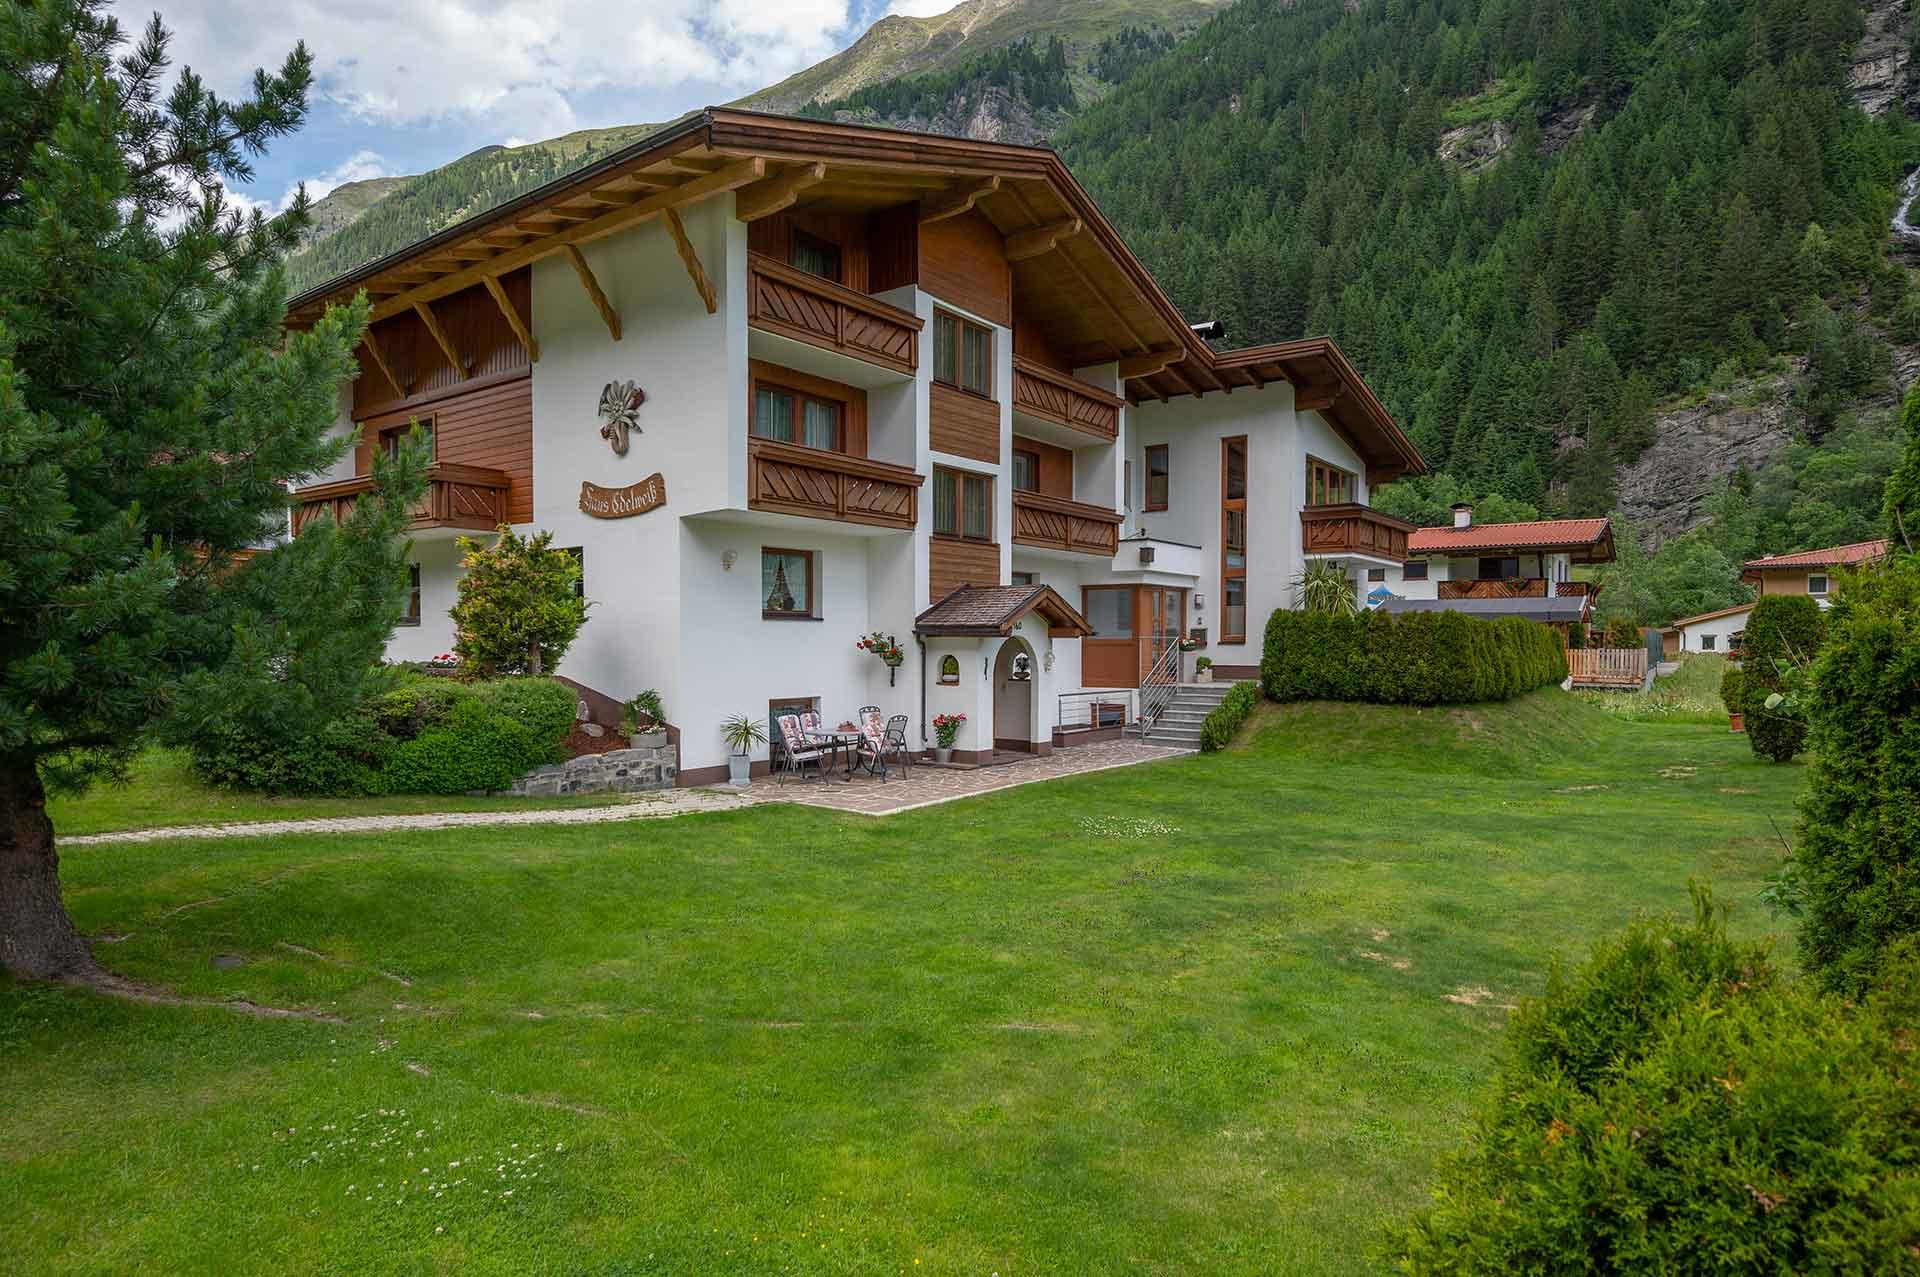 Edelweiss Hostel St. Leonhard